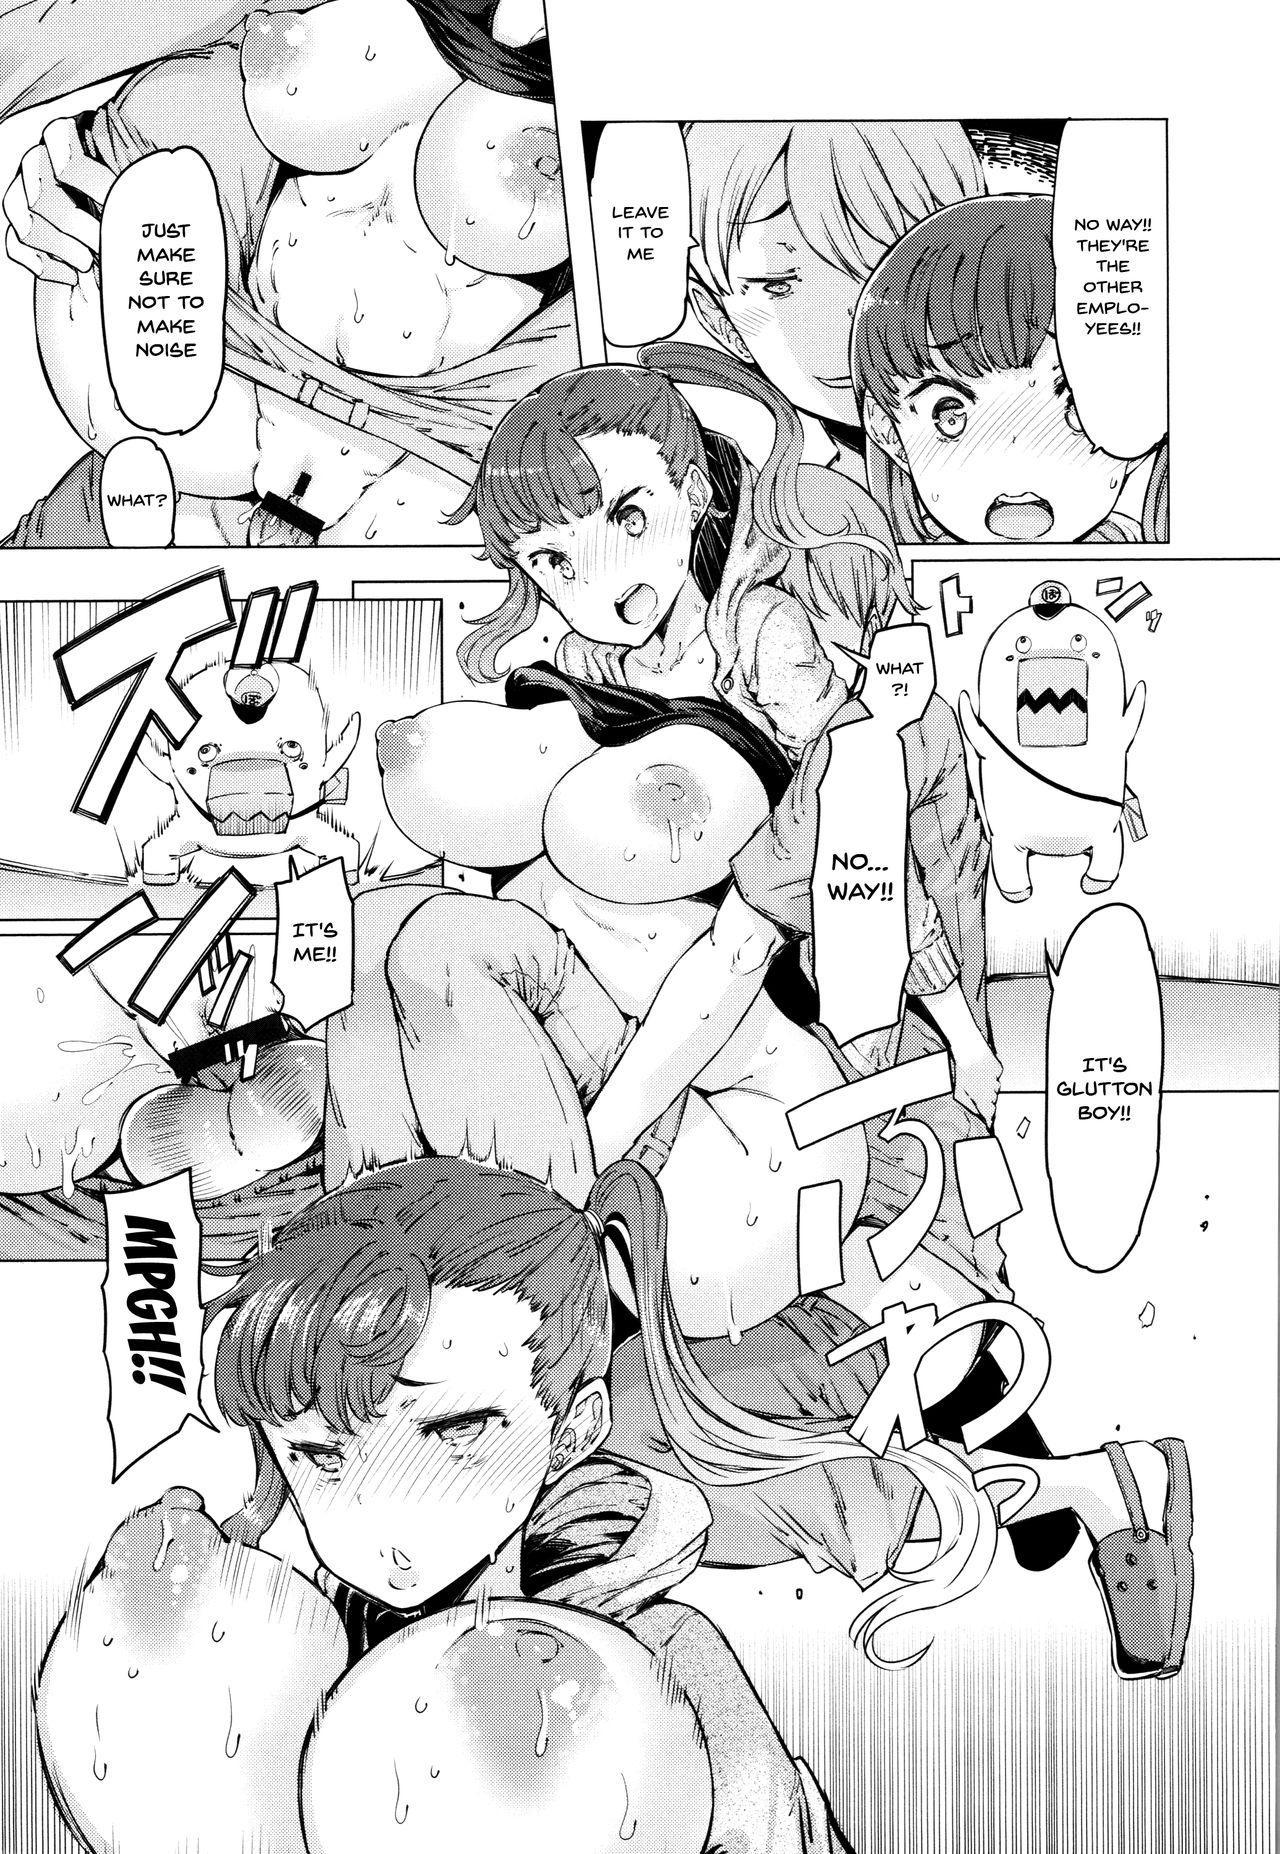 Hitozuma ga Ero Sugite Shigoto ni Naranai! | These Housewives Are Too Lewd I Can't Help It! Ch.1-7 34